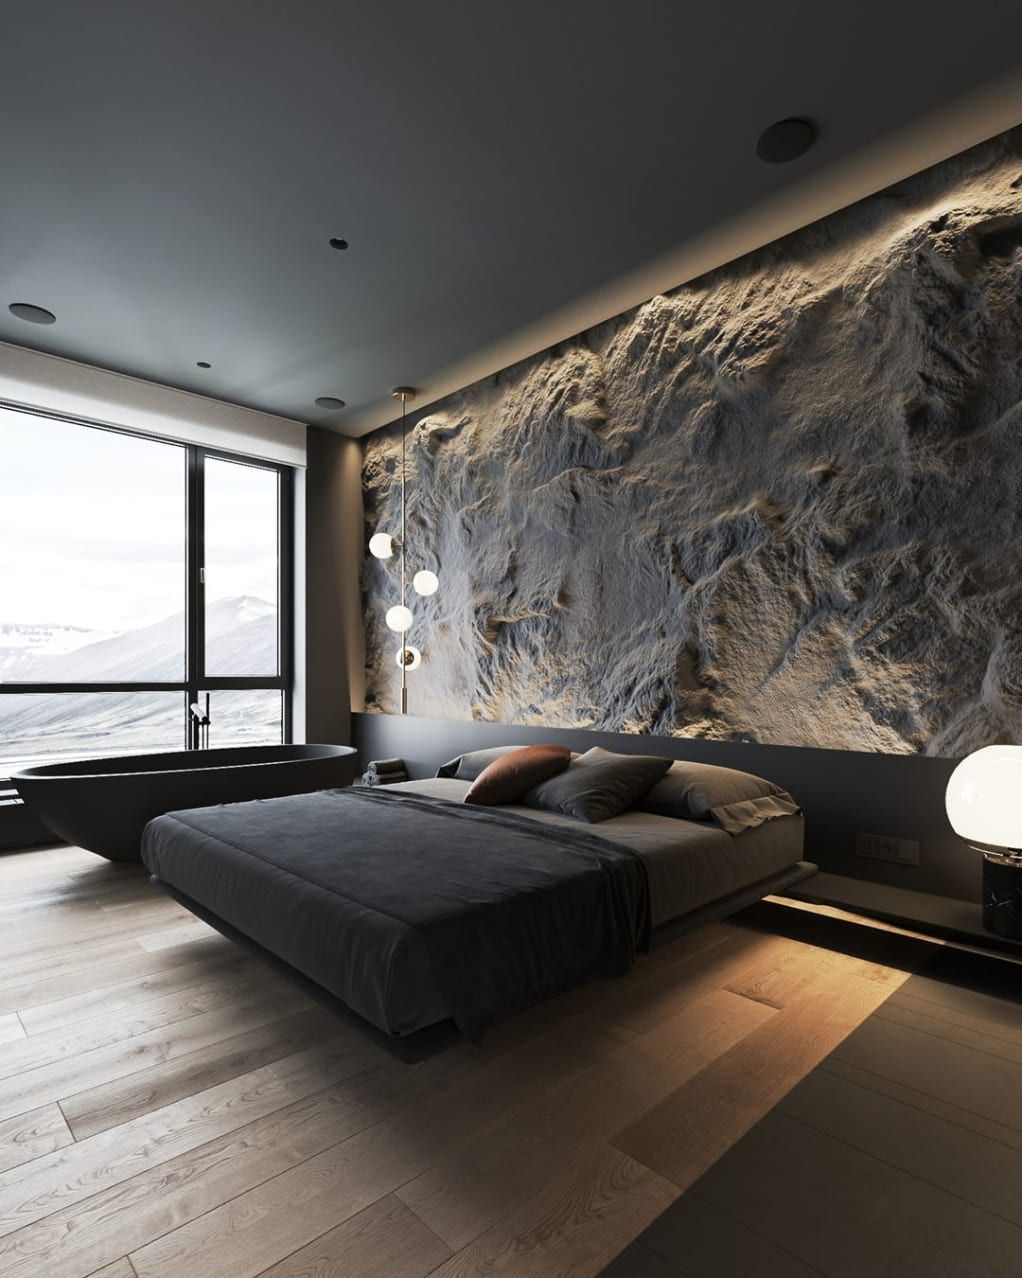 Unique Stone Headboard for Luxury Bedroom